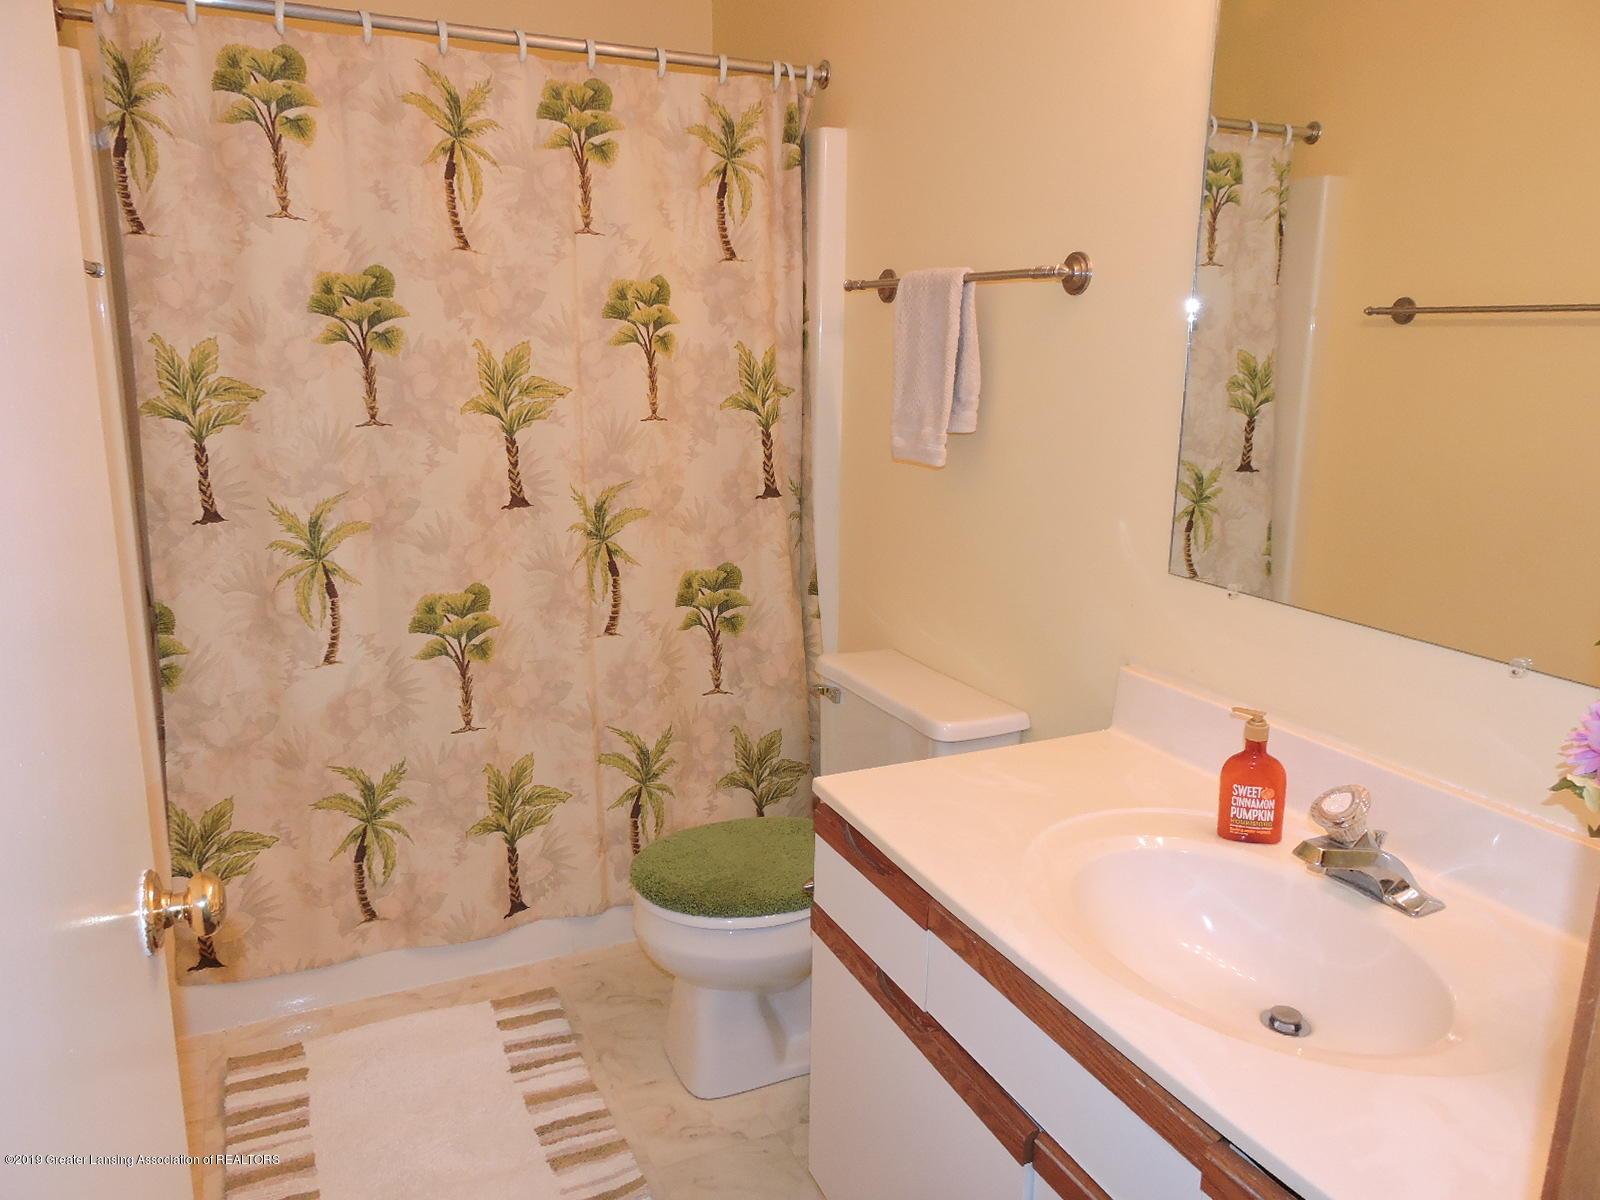 12719 Ontonagon Dr - 2nd Floor Full Bath - 19